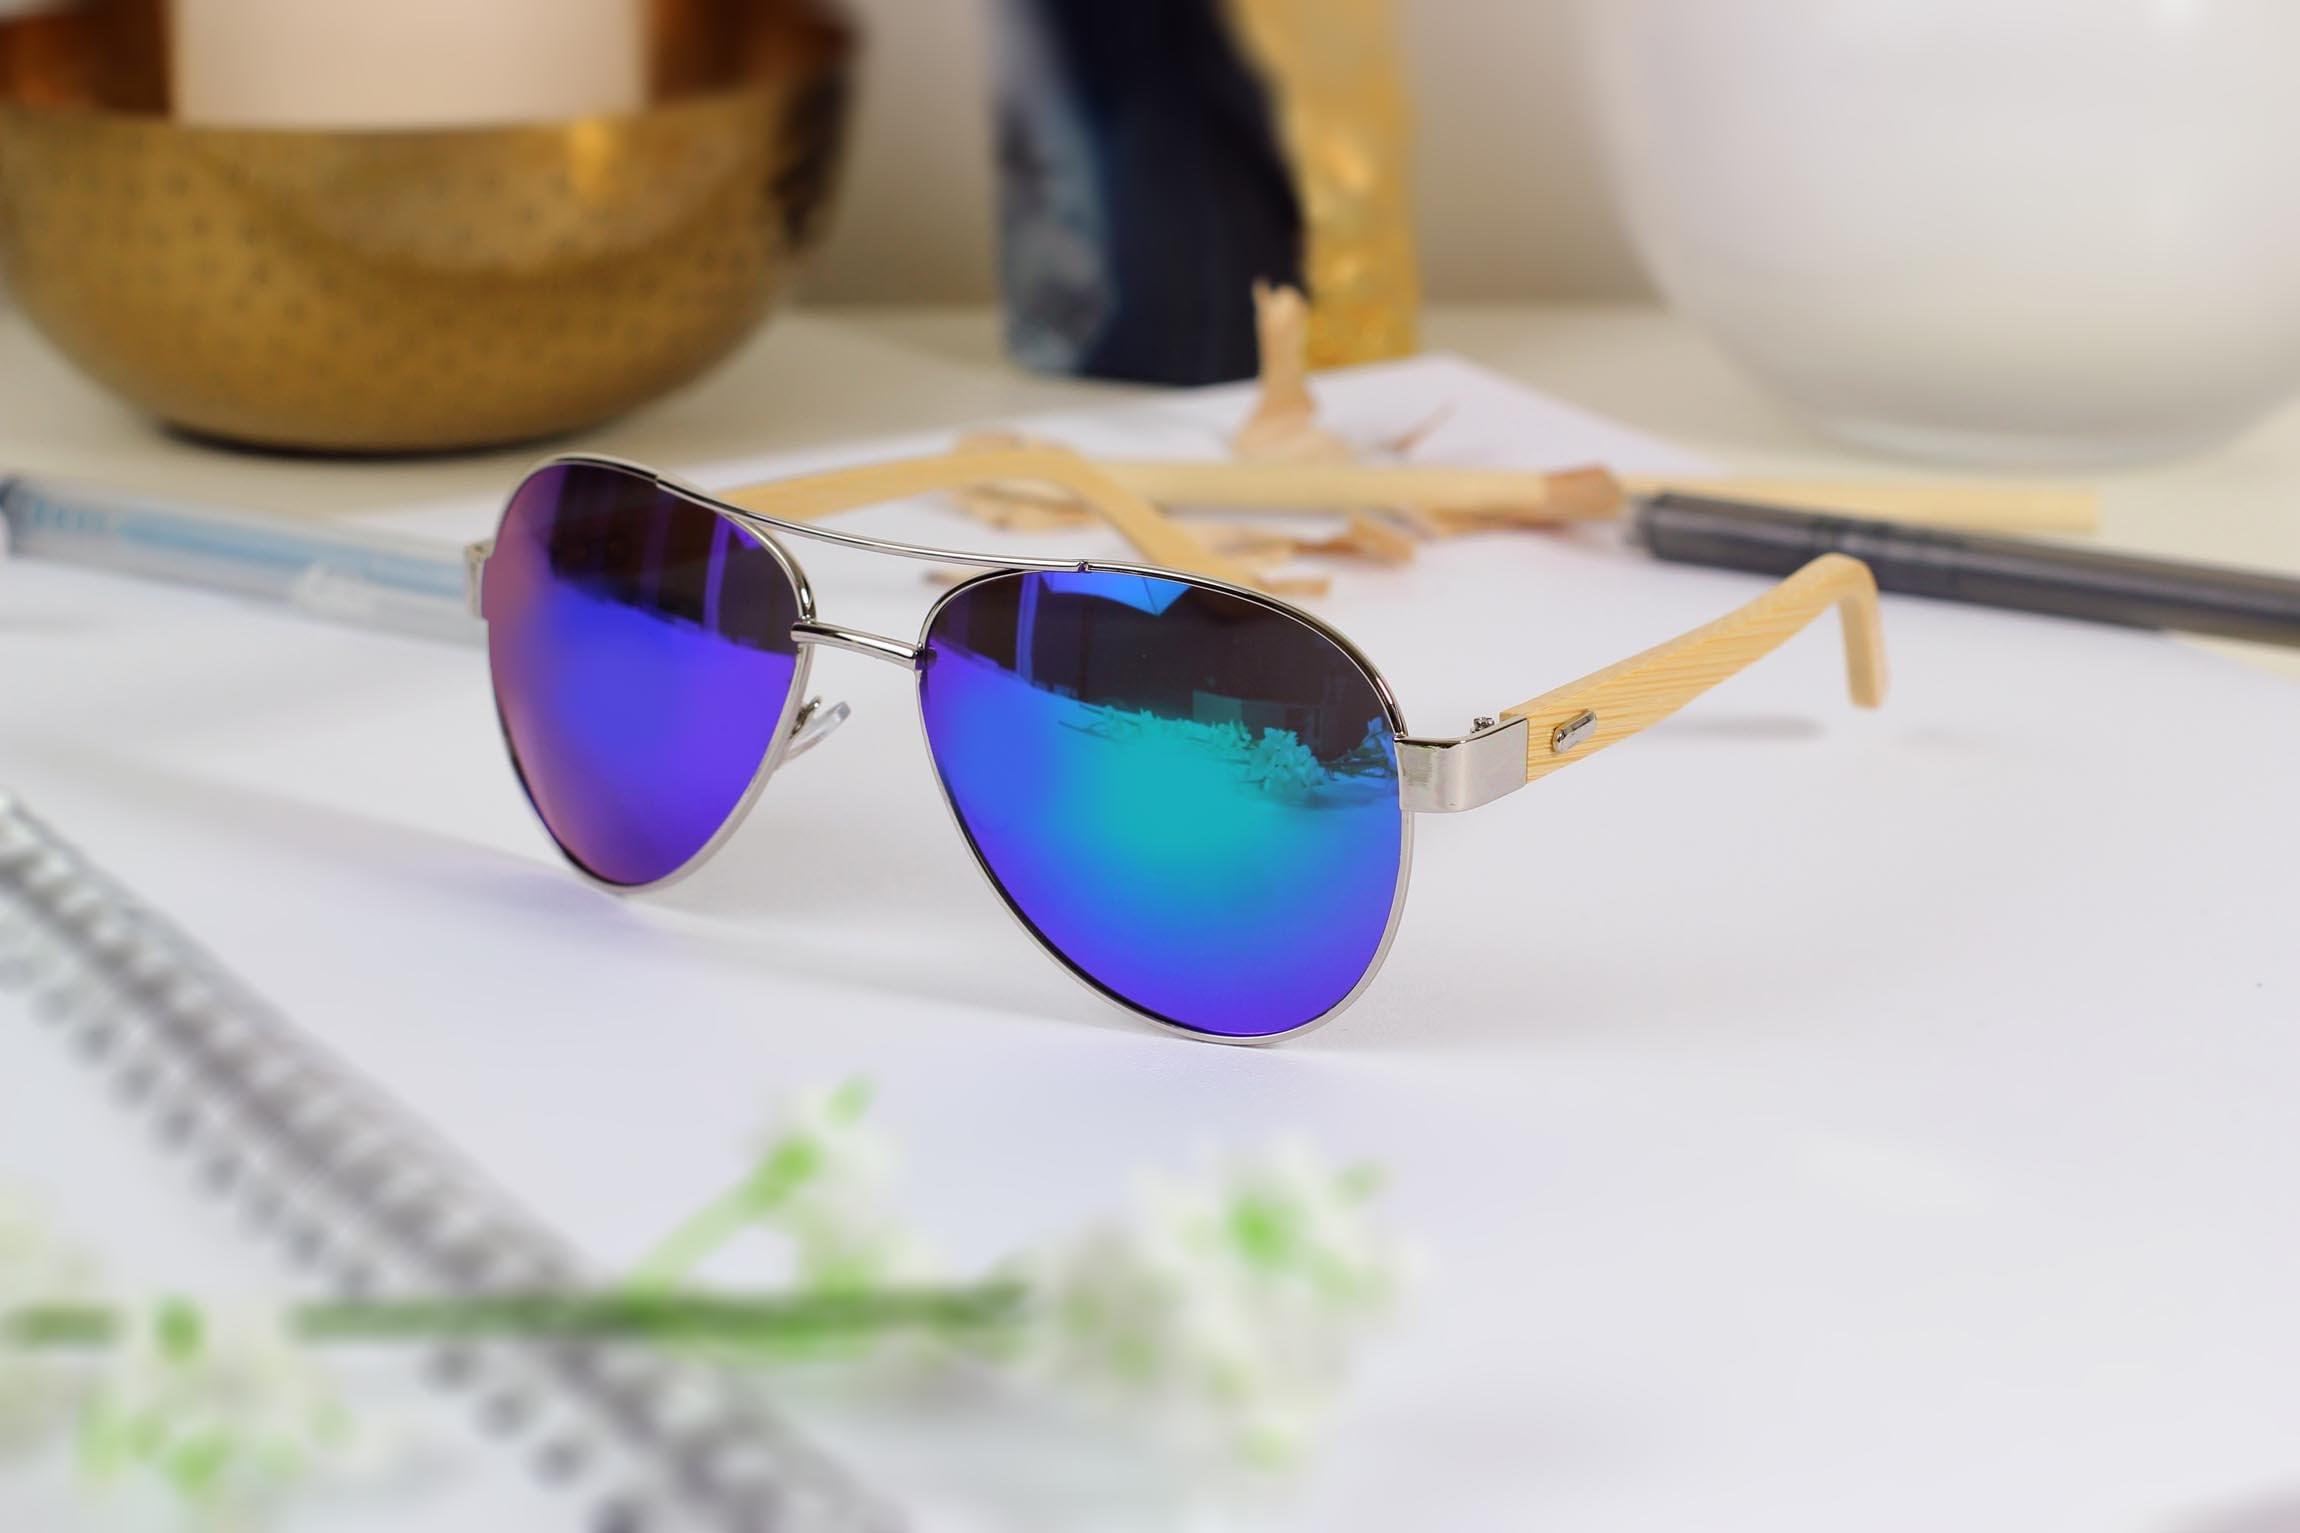 Blue Ray Aviator Style Sunglasses Personalised Wooden Sunglasses